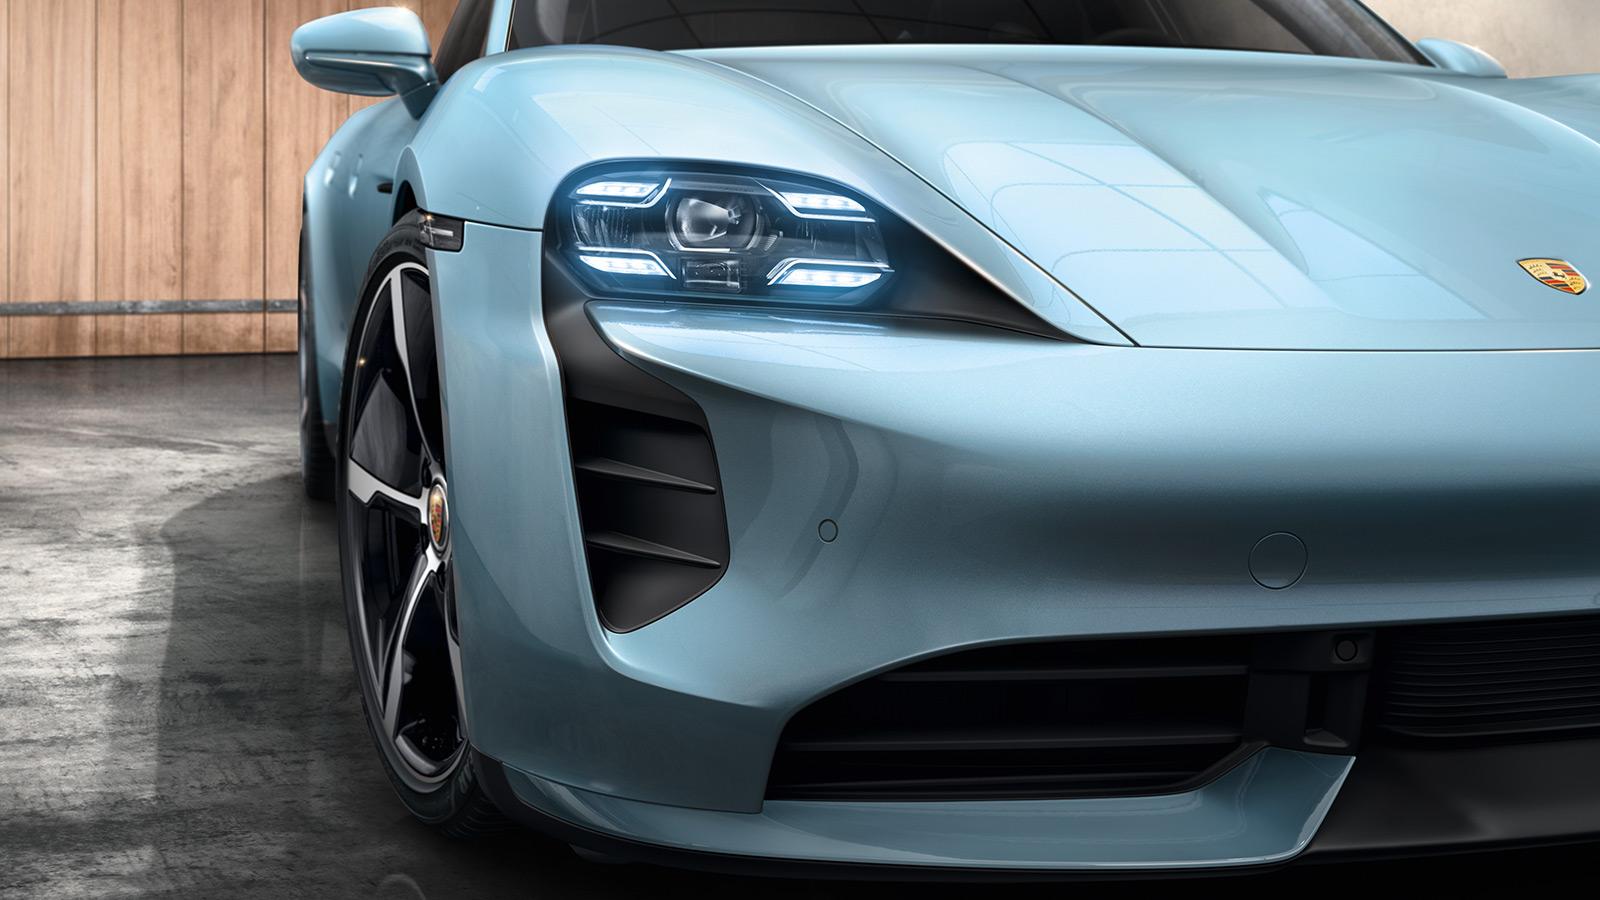 Porsche - Фары и задние фонари